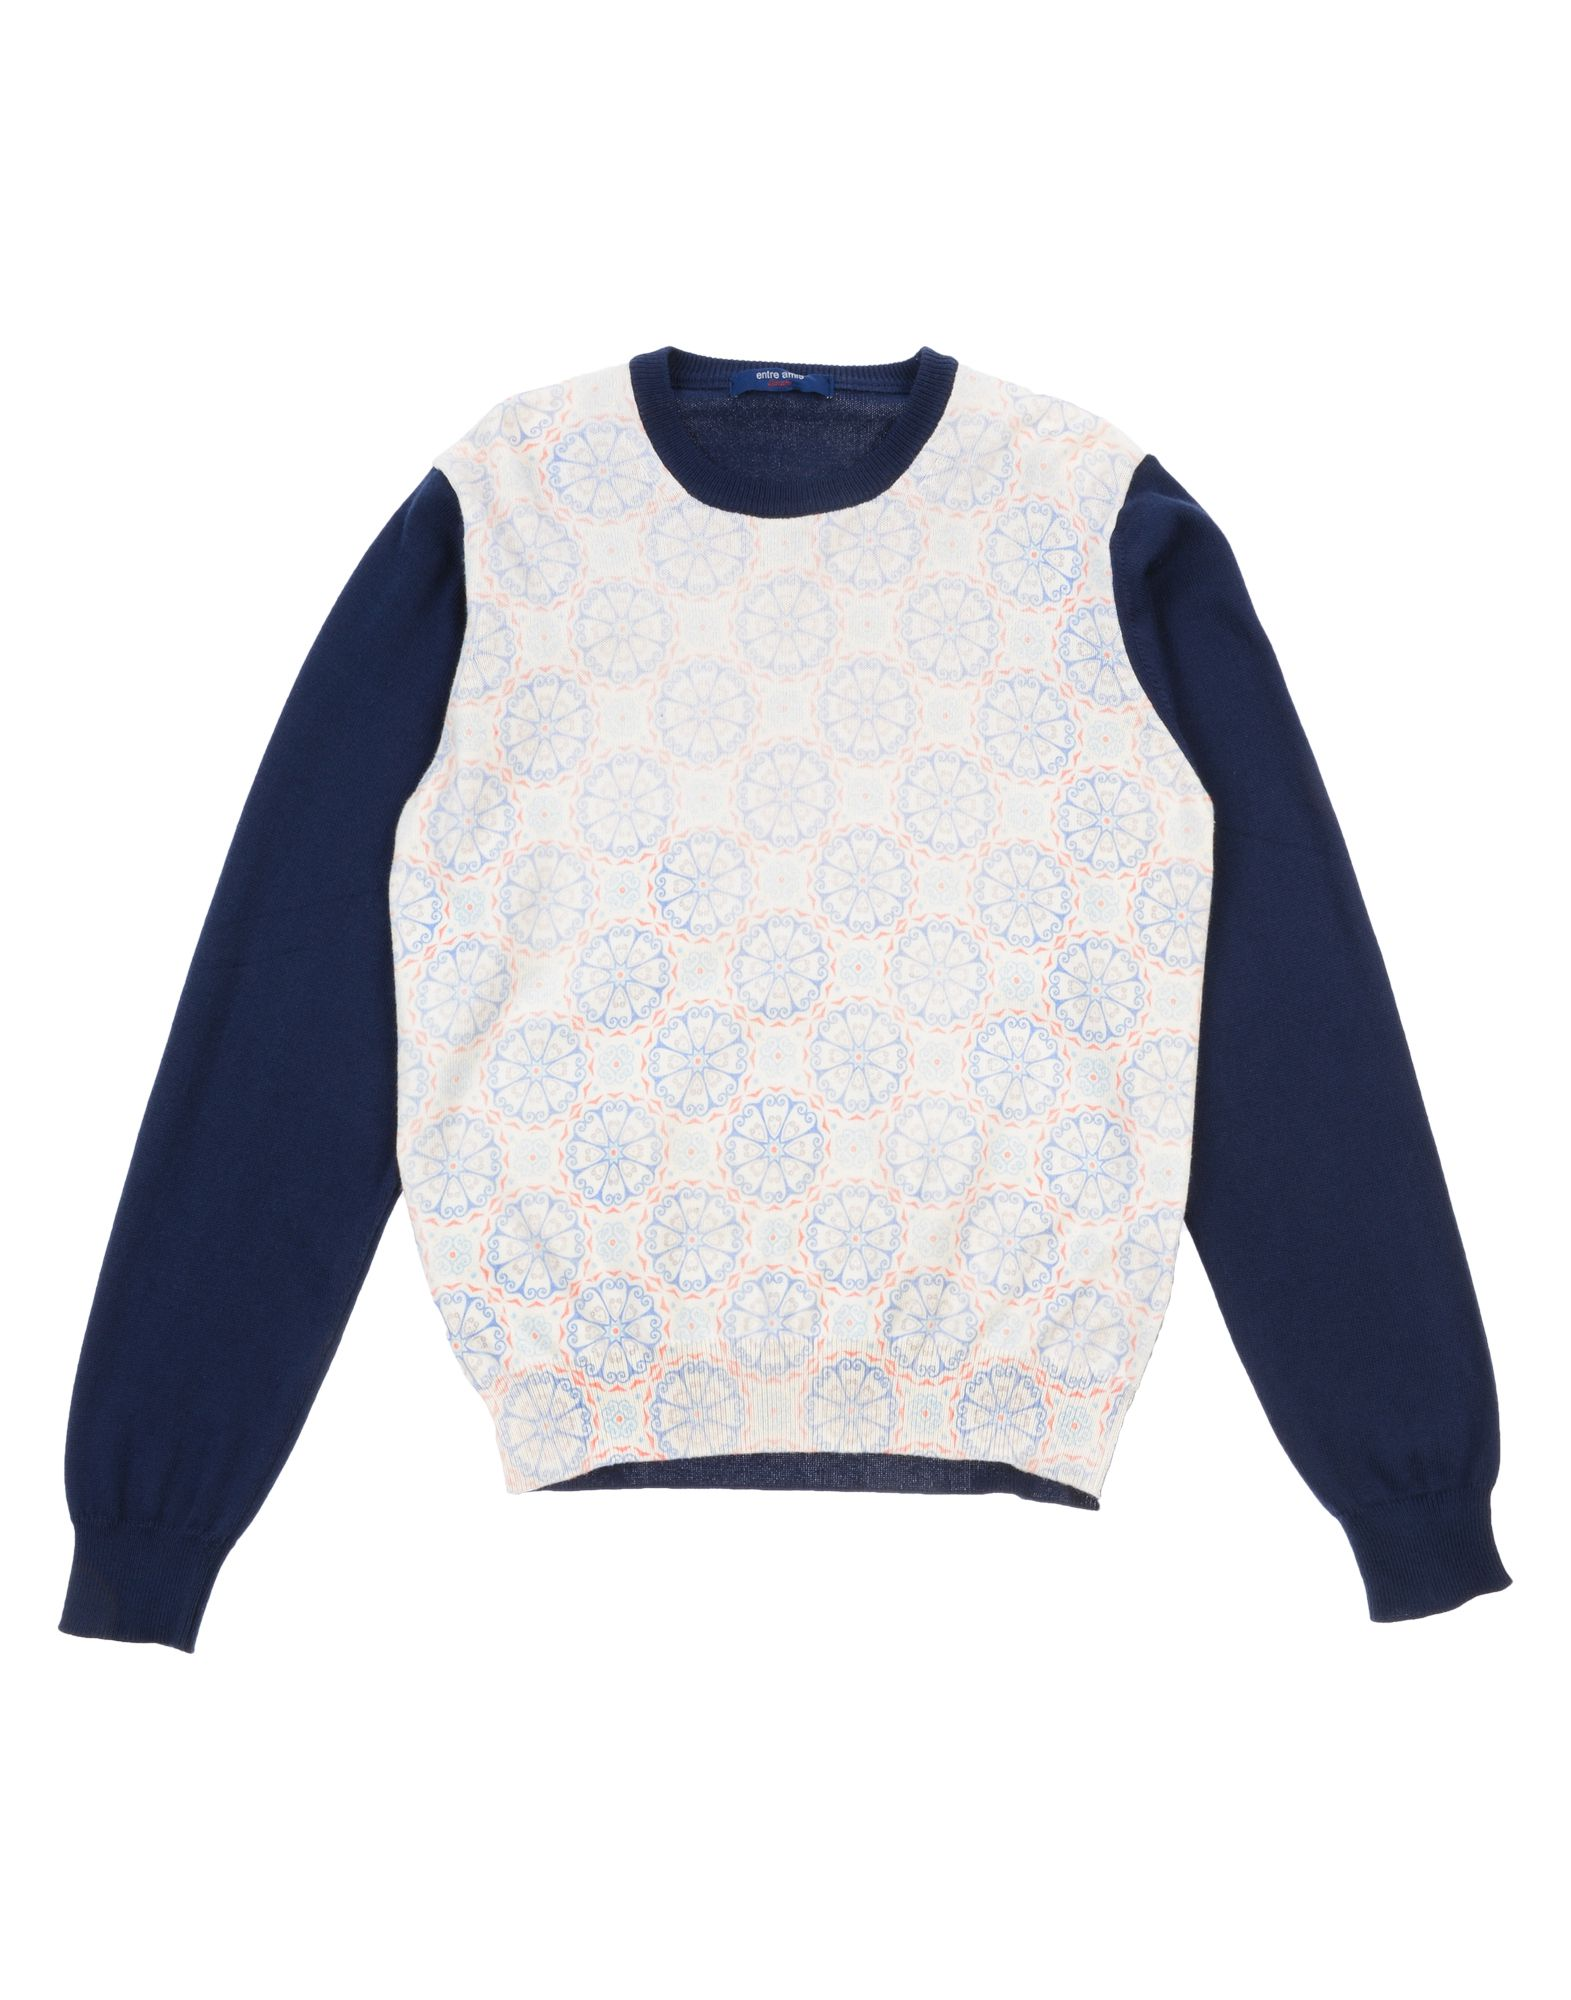 Entre Amis Garçon Kids' Sweaters In Dark Blue